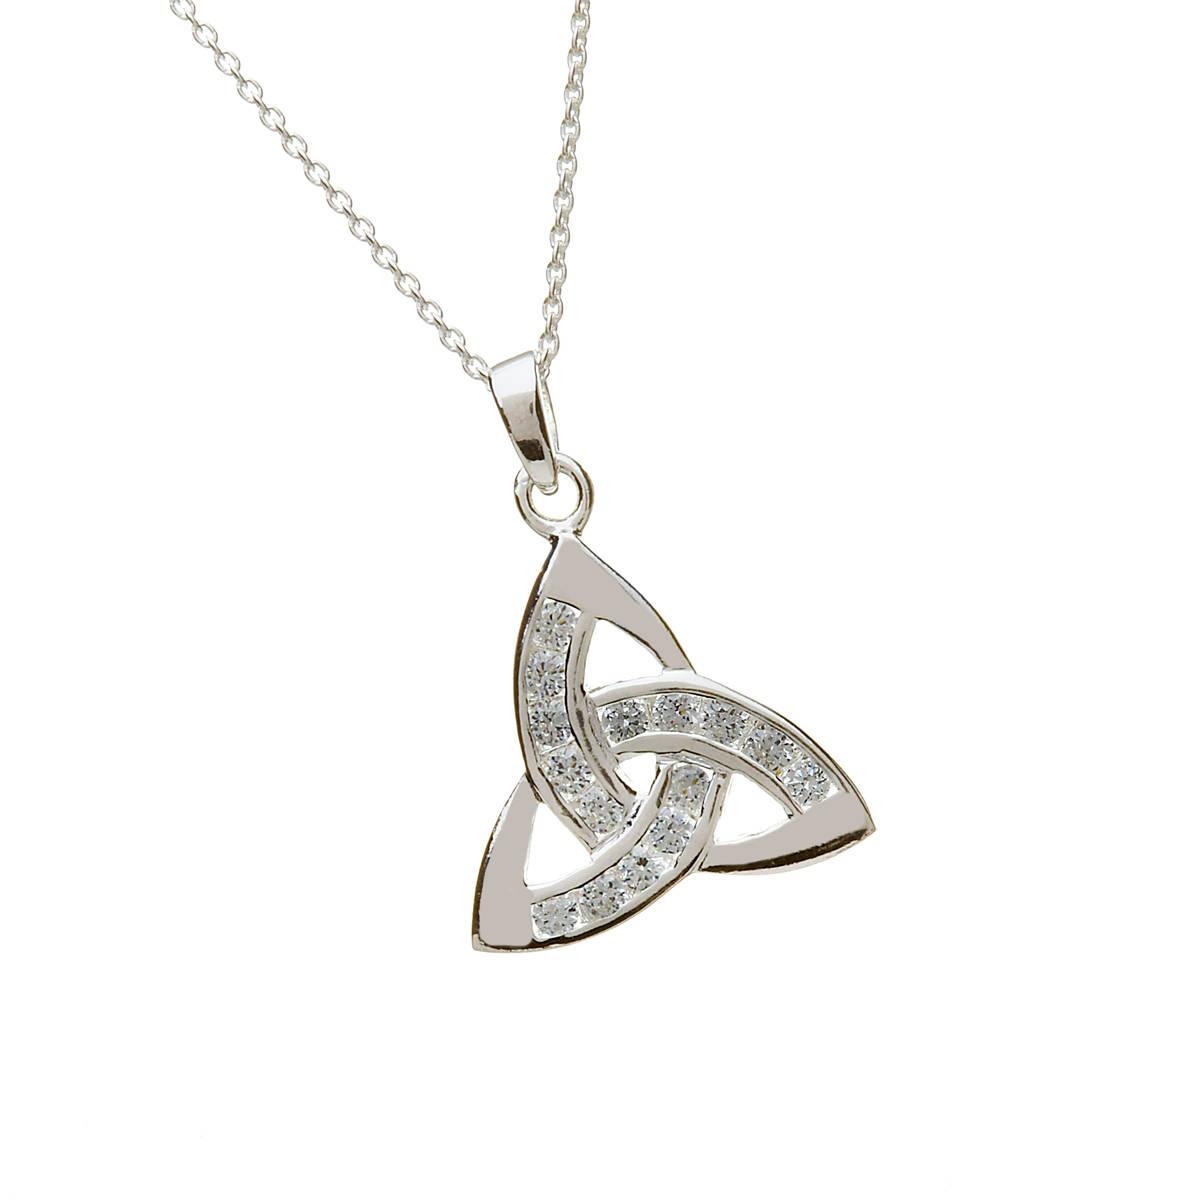 Silver Cz Trinity Knot Pendant